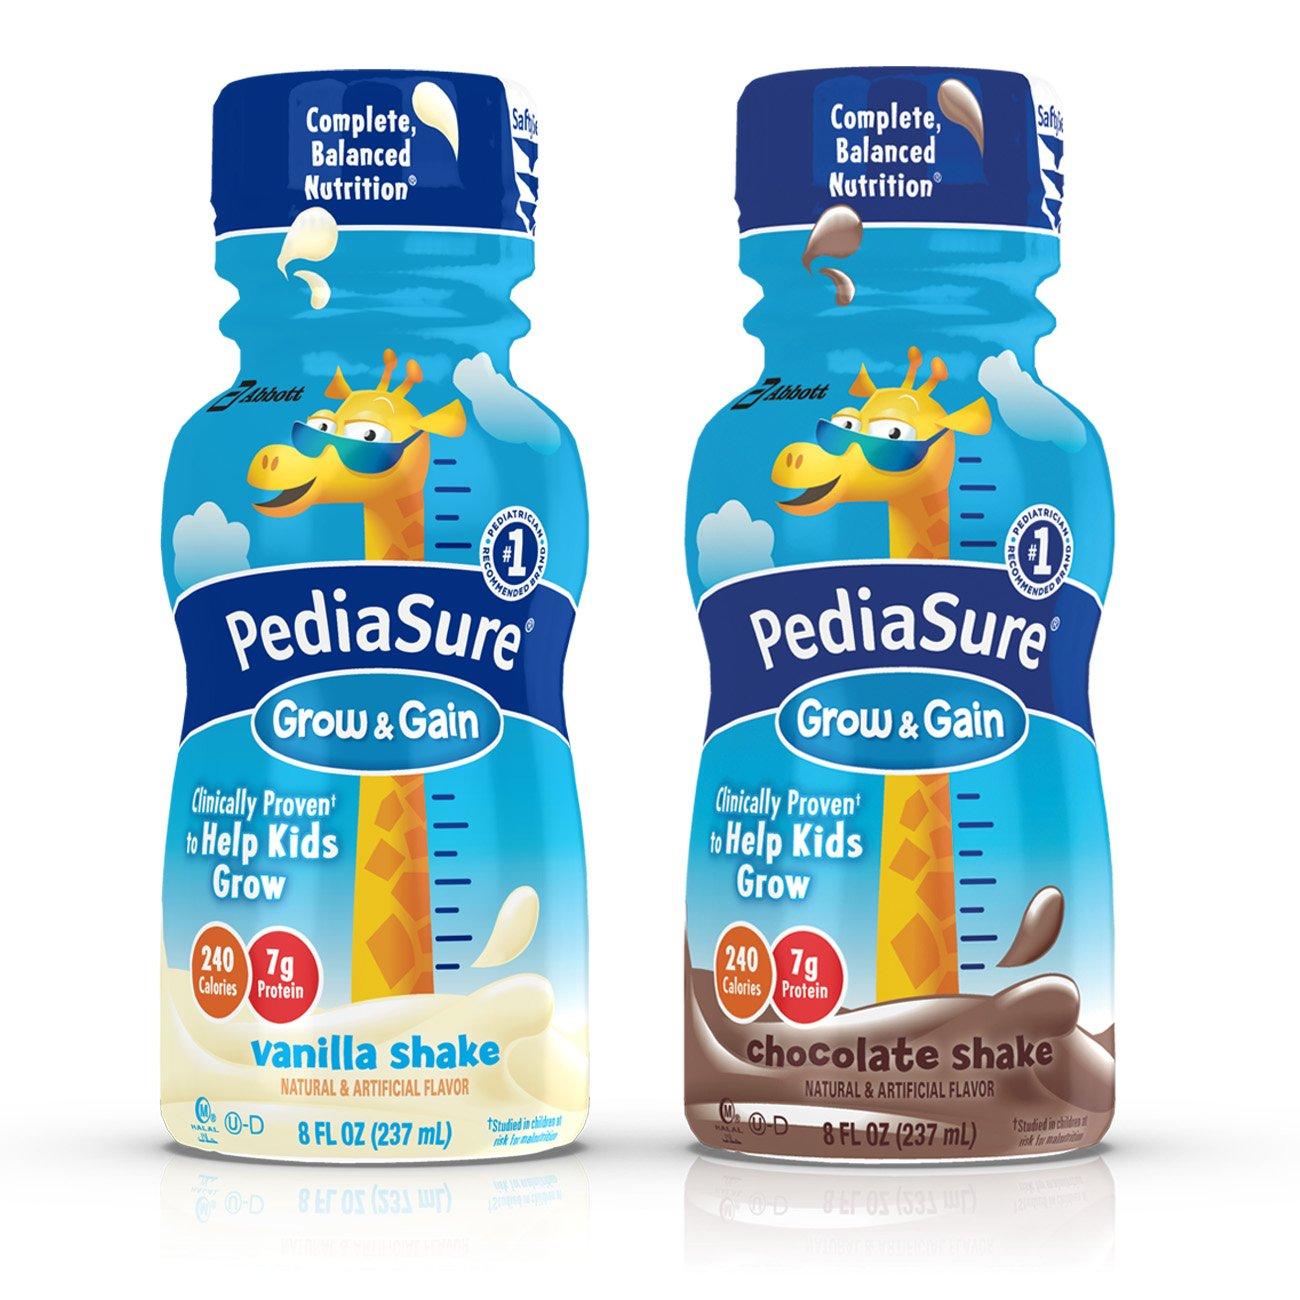 PediaSure Grow & Gain Nutrition Shake Variety Pack Ready-to-Drink 8 fl oz Bottles (Pack of 24) by Pediasure Base